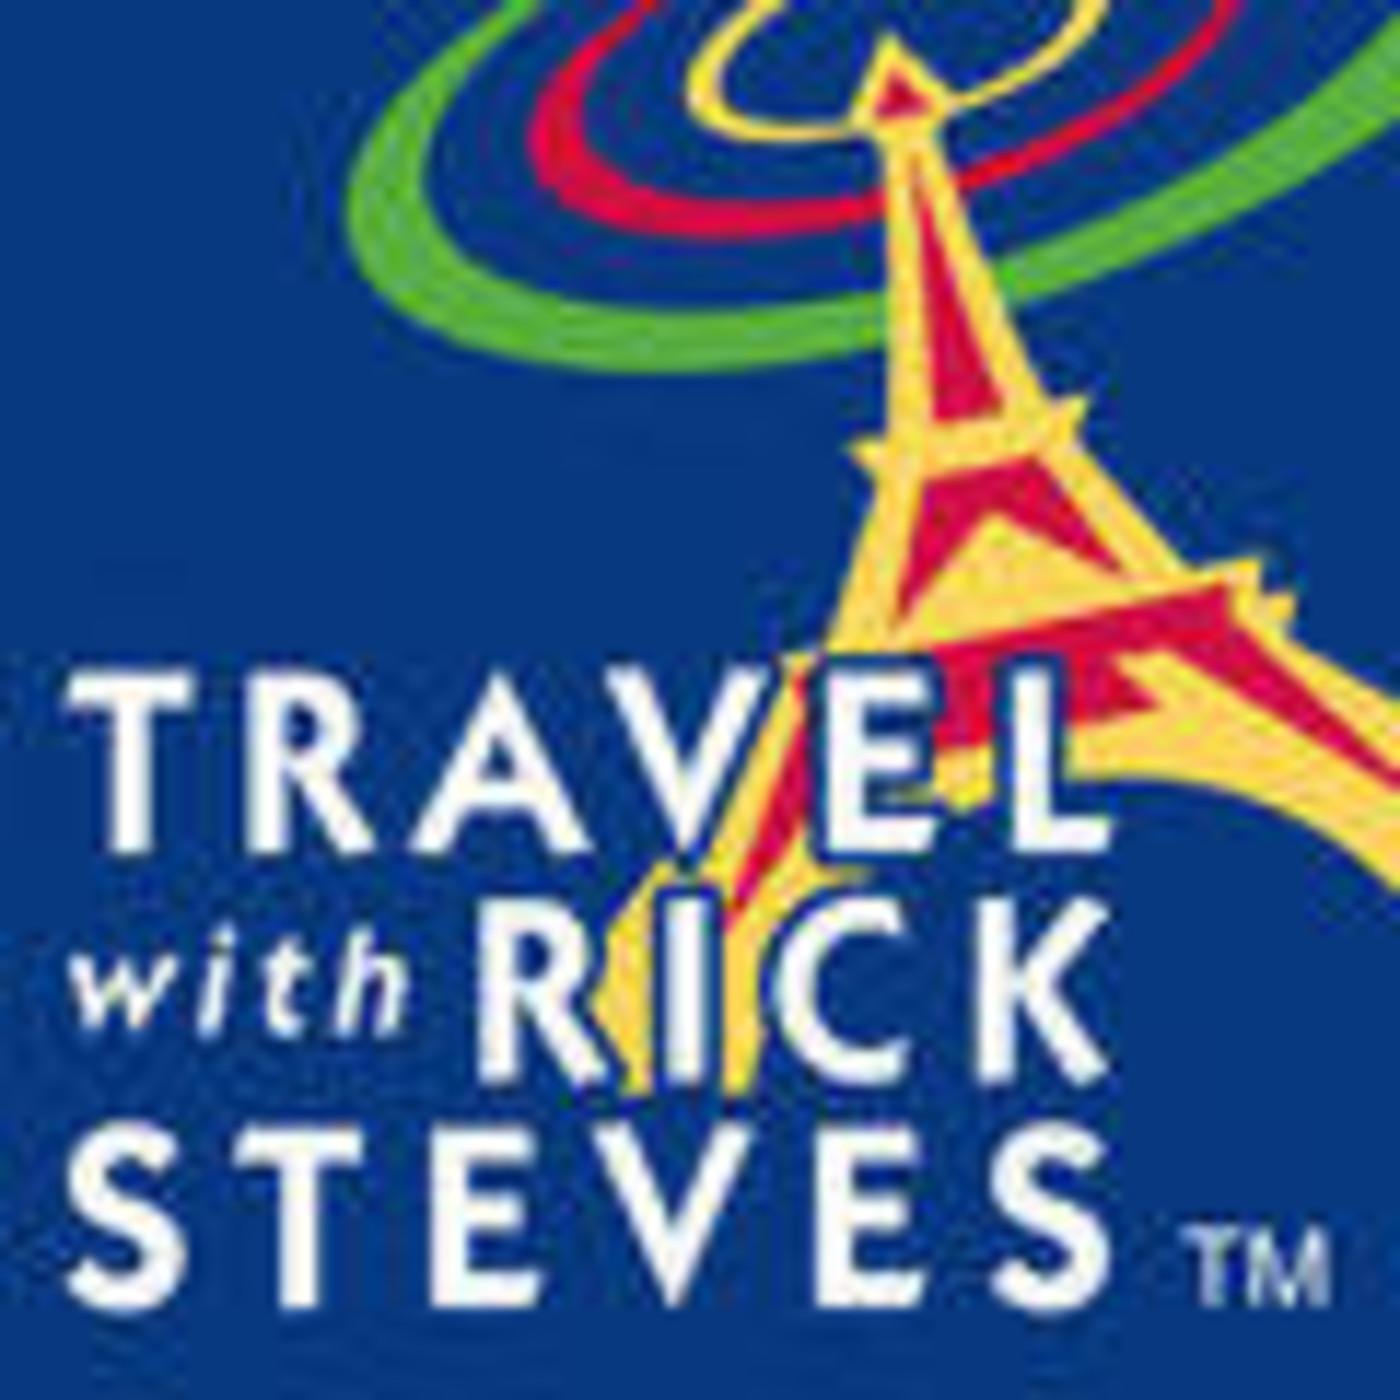 www.ricksteves.com